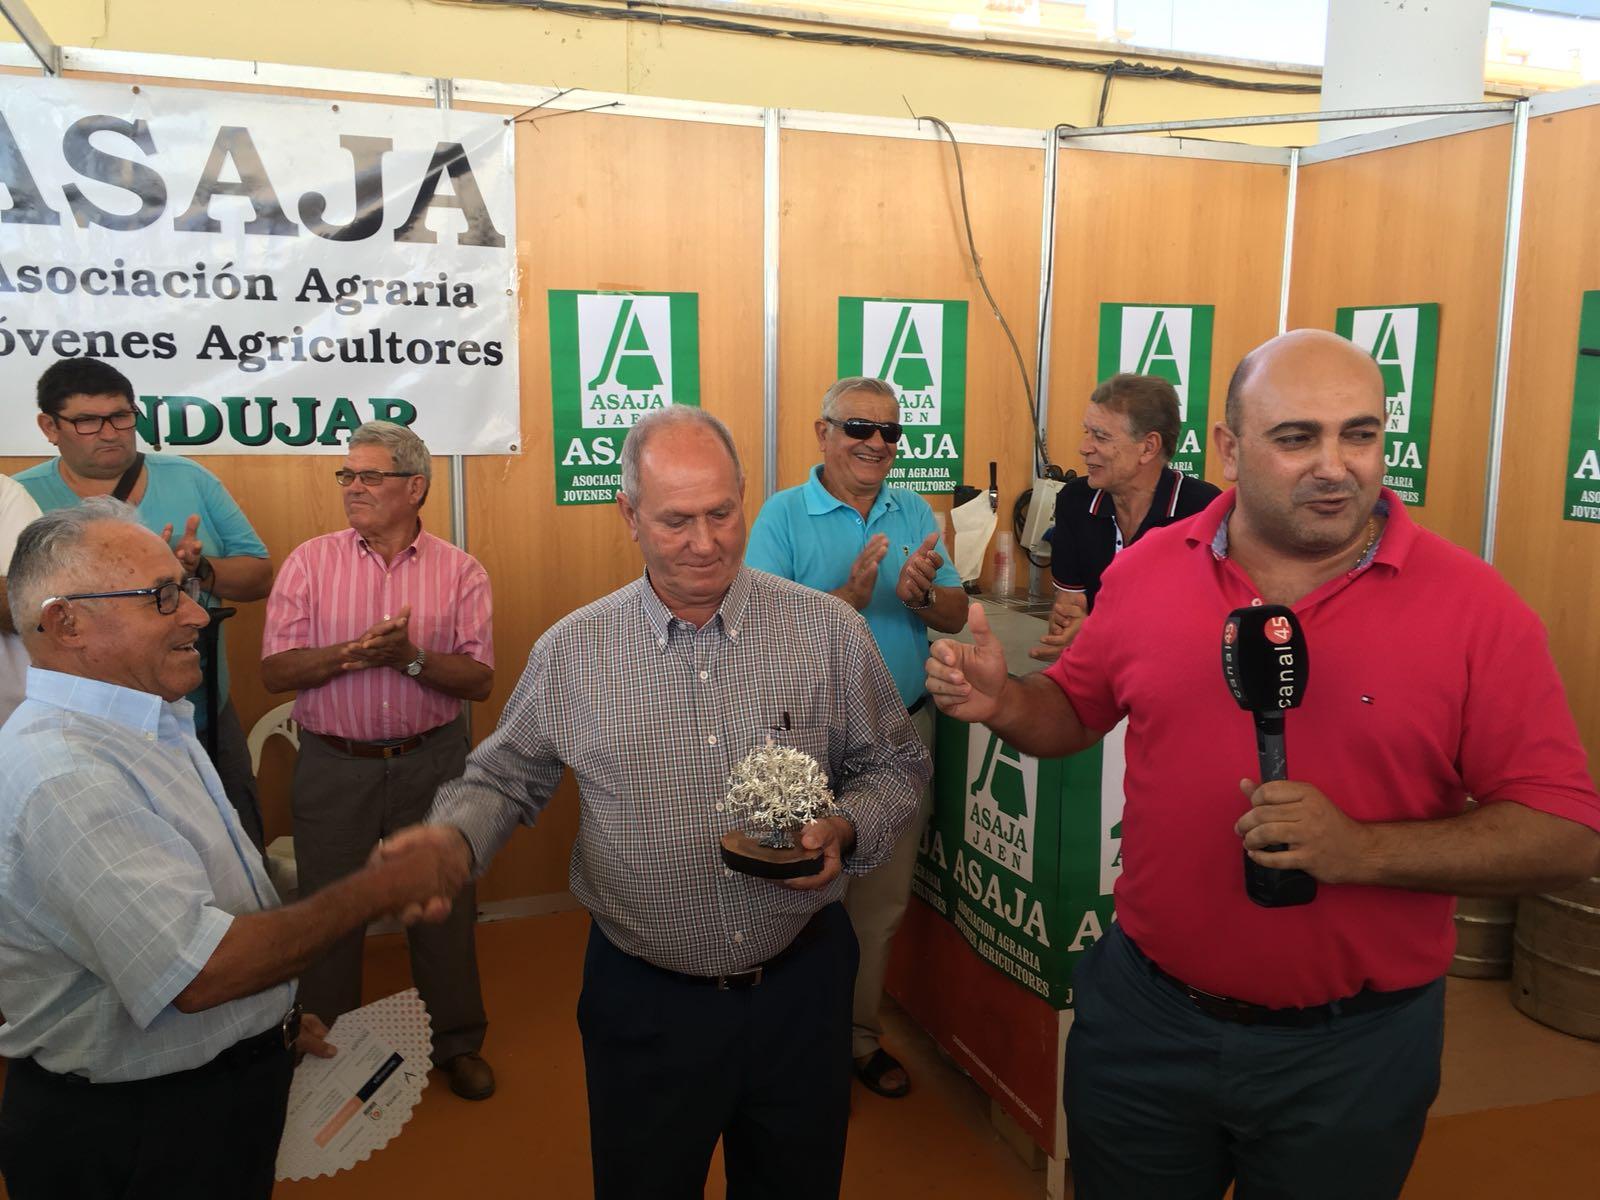 ASAJA Andújar premia con su olivo de plata a Diego Ortega Lara